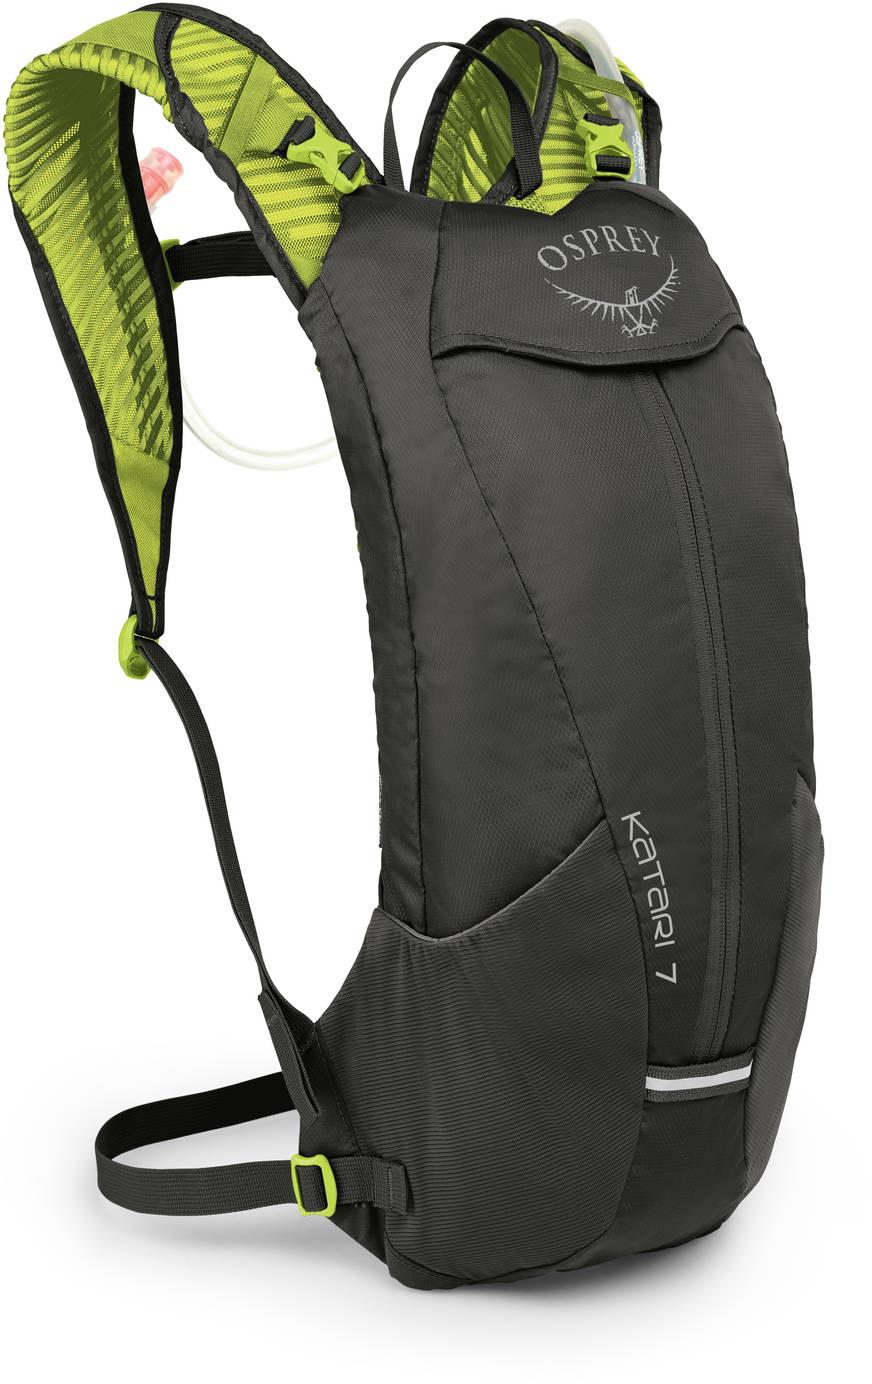 Рюкзаки для бега Рюкзак мультиспортивный Osprey Katari 7 Lime Stone Katari_7_S19_Side_Lime_Stone_web.jpg